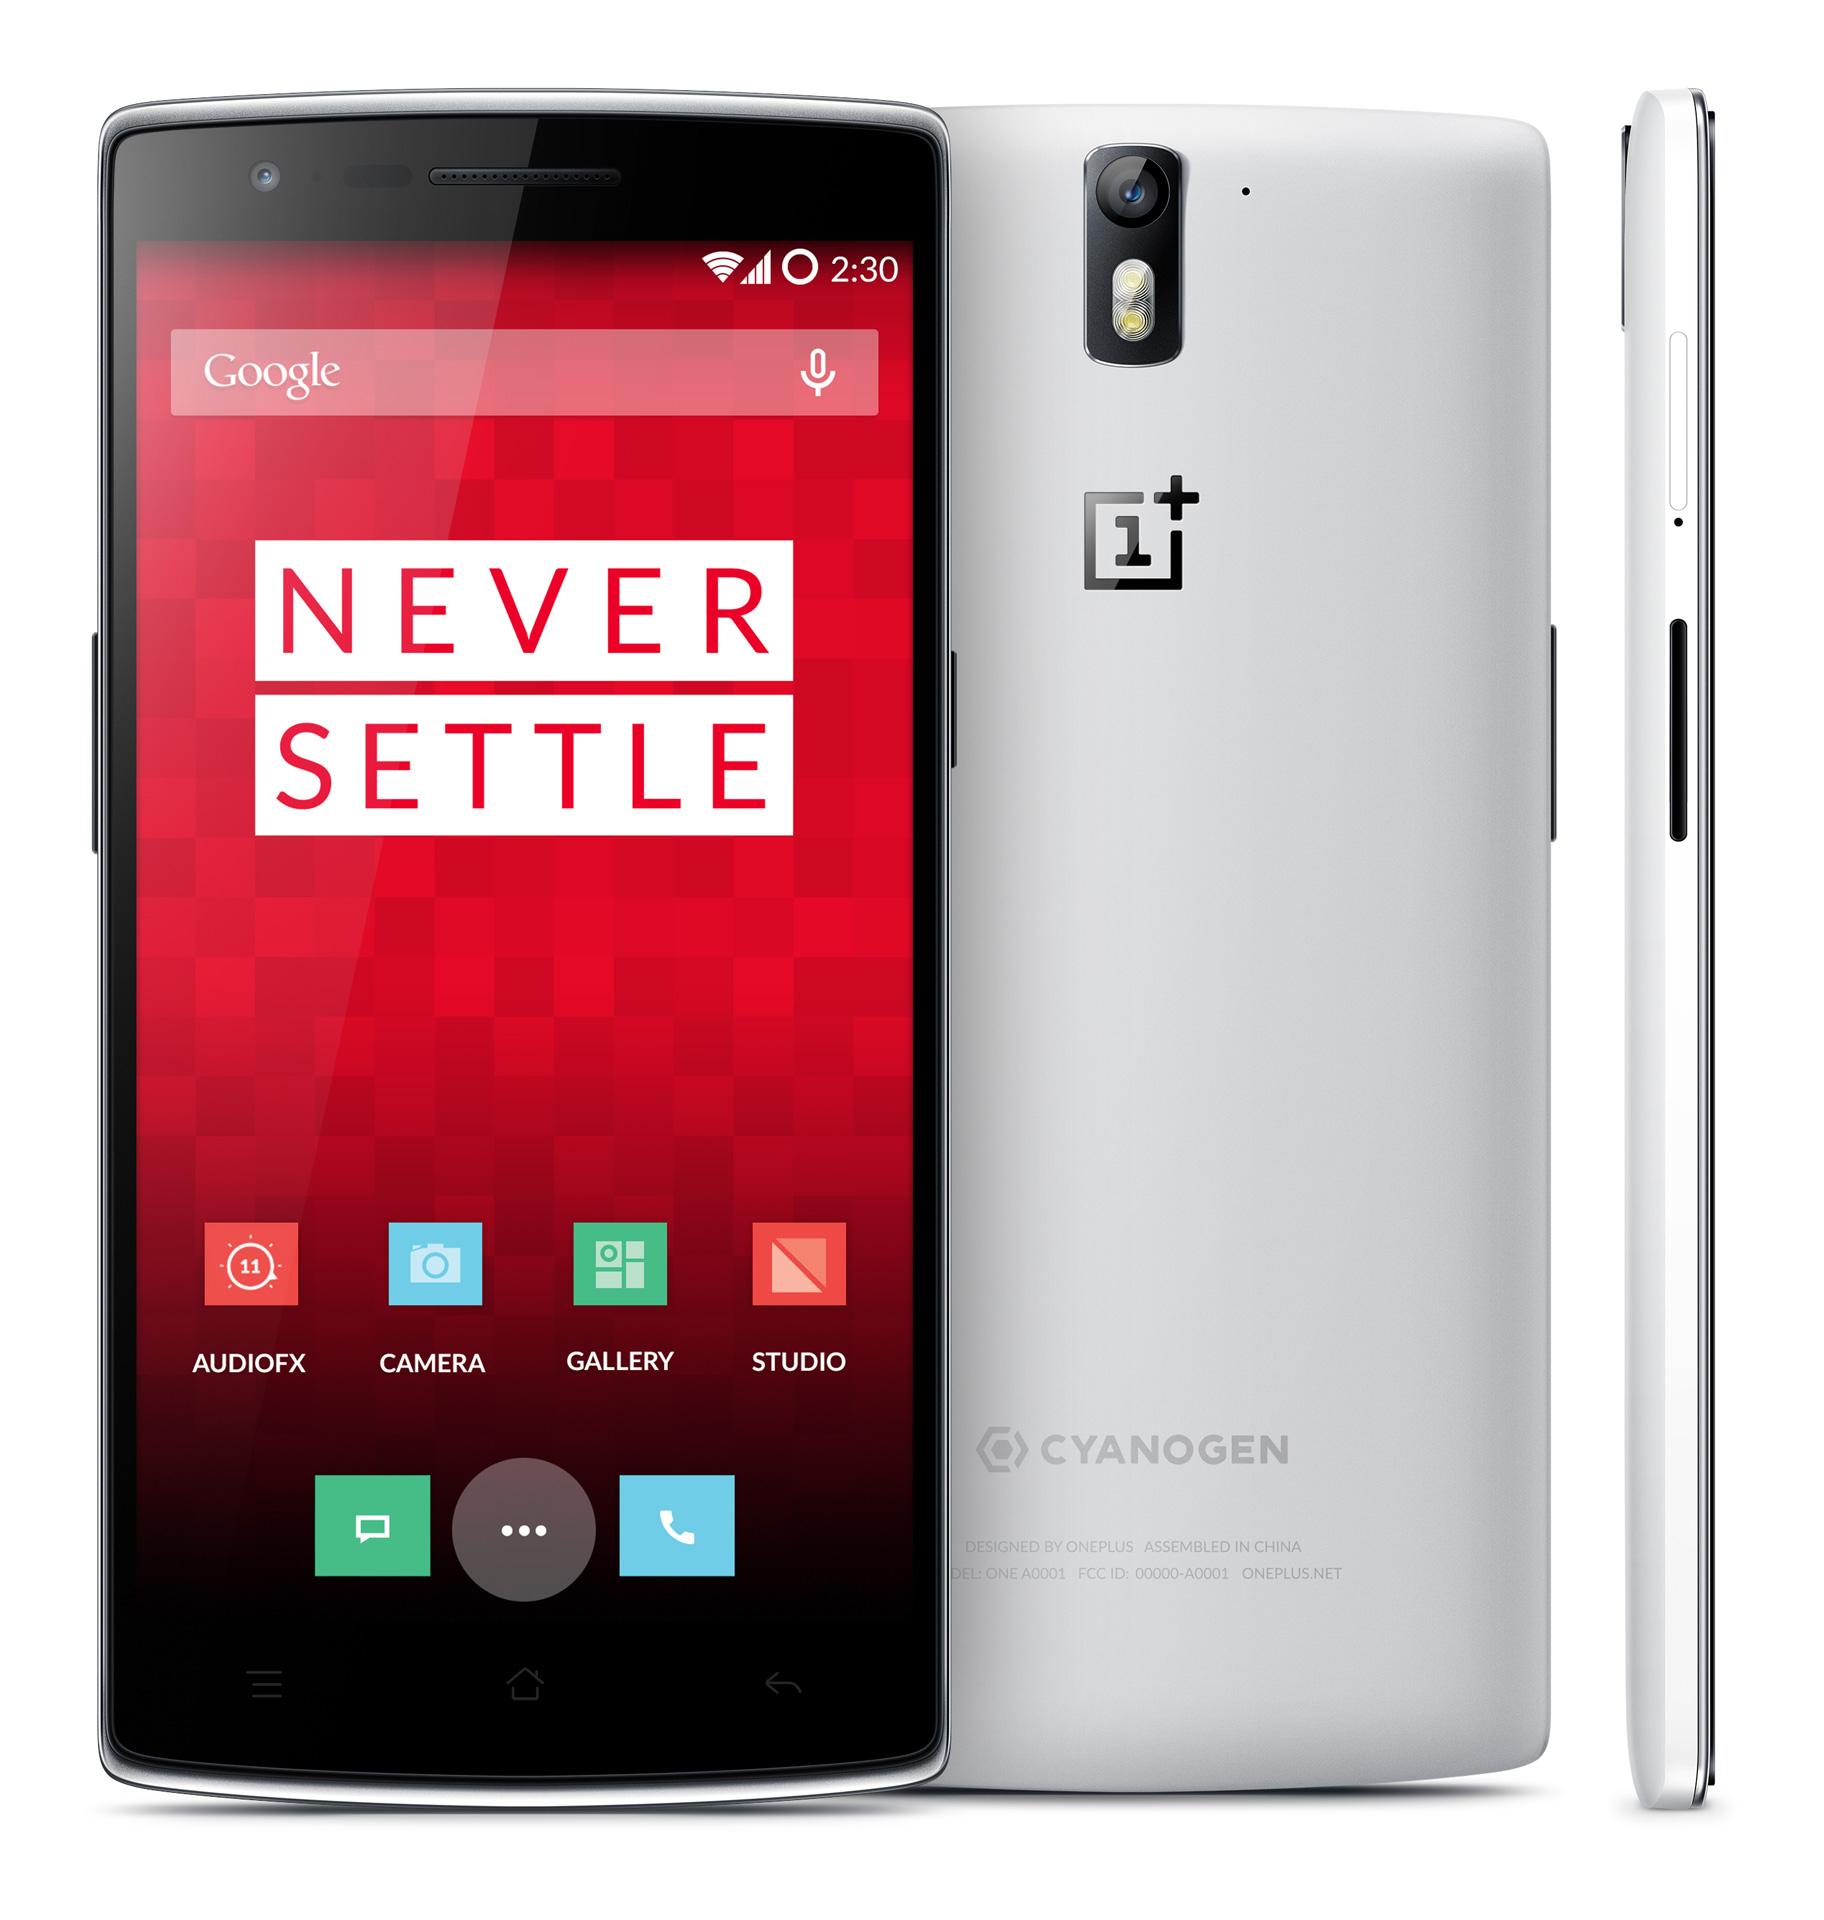 "Smartphone One Plus One - Ecran 5,5"", 16 Go, 4G, 1080P, 13MP, CyanogenMod"